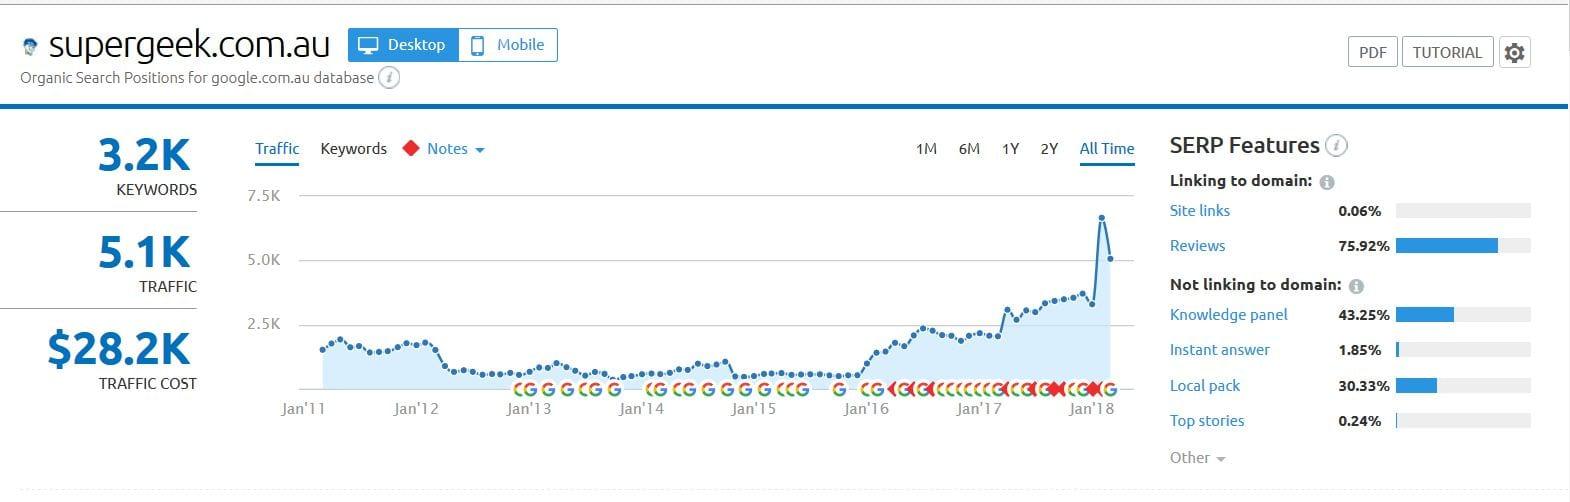 SuperGeek Organic Search Traffic Growth